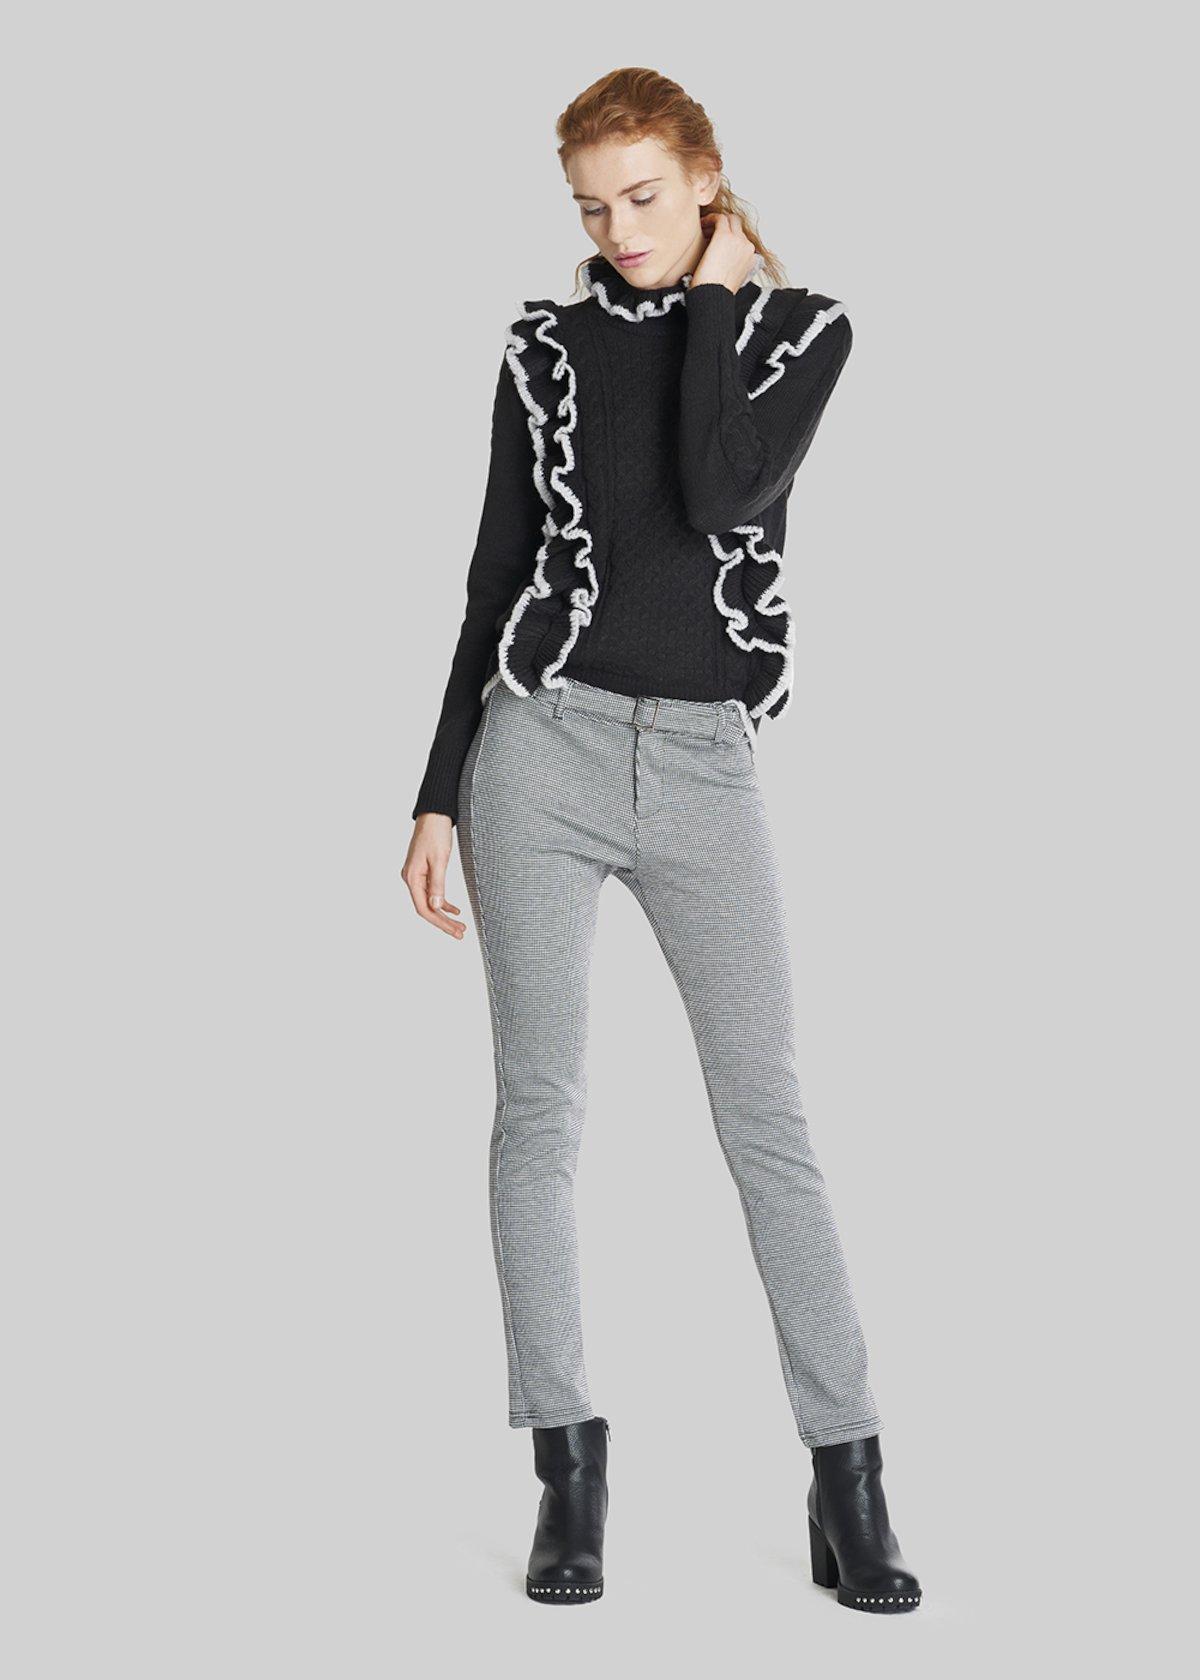 Paliky trousers with waist belt - Black White Fantasia